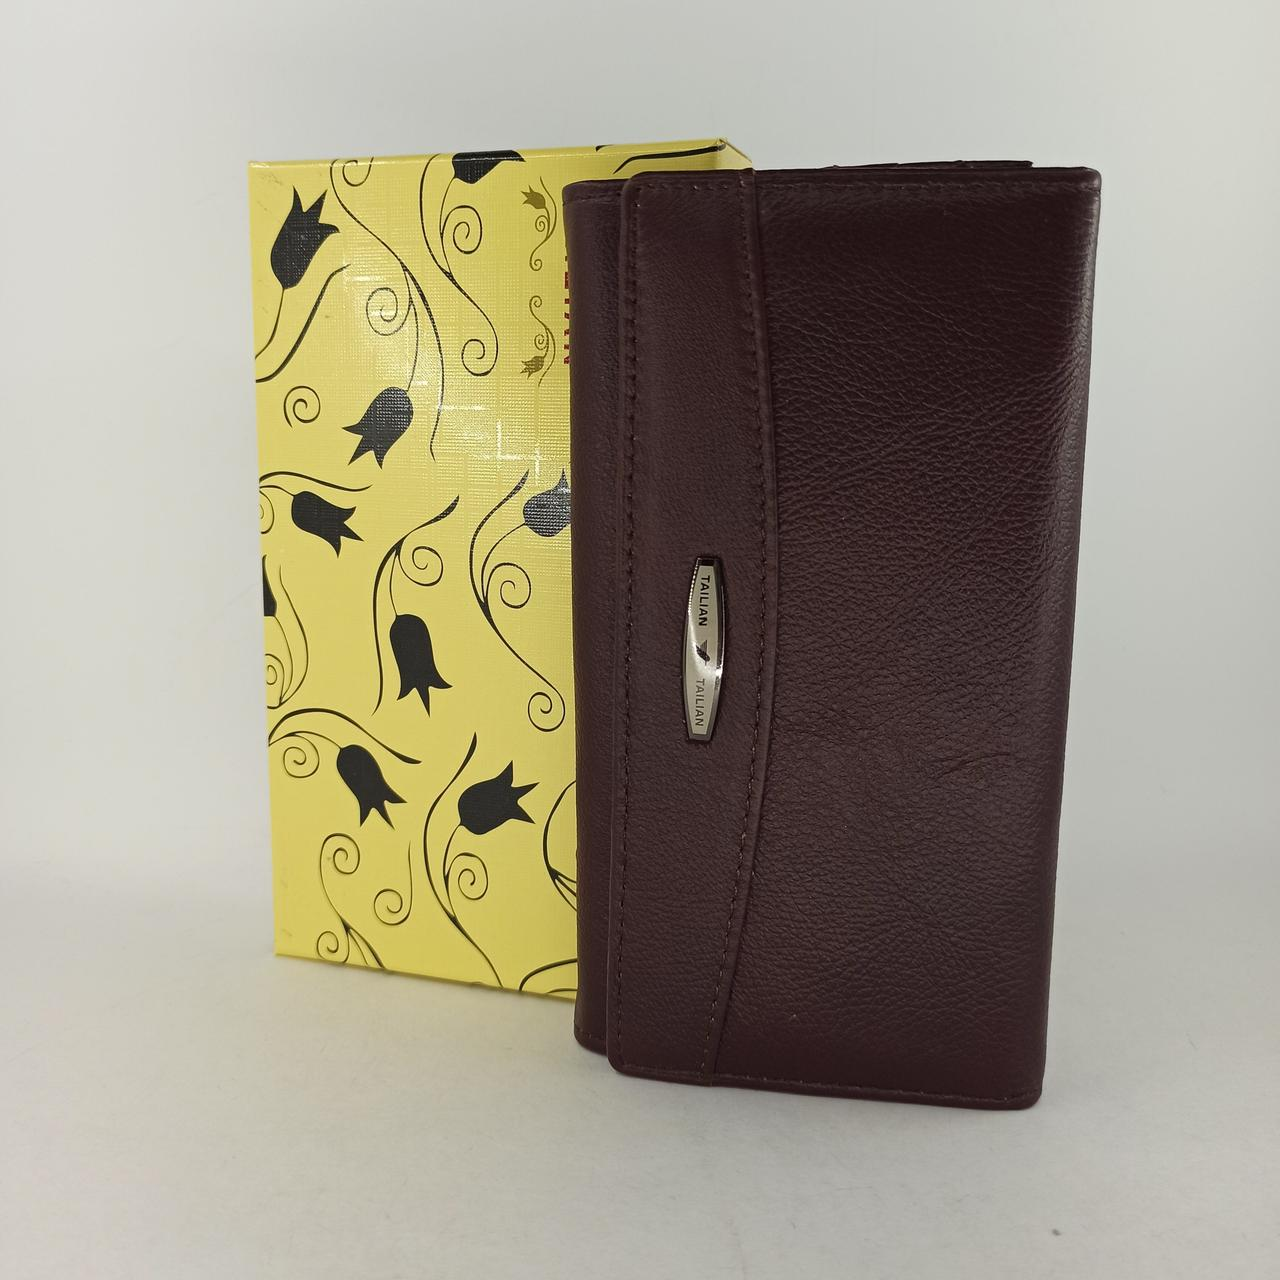 Класичний шкіряний жіночий гаманець / Классический кожаный женский кошелек Tailian T515 crimson